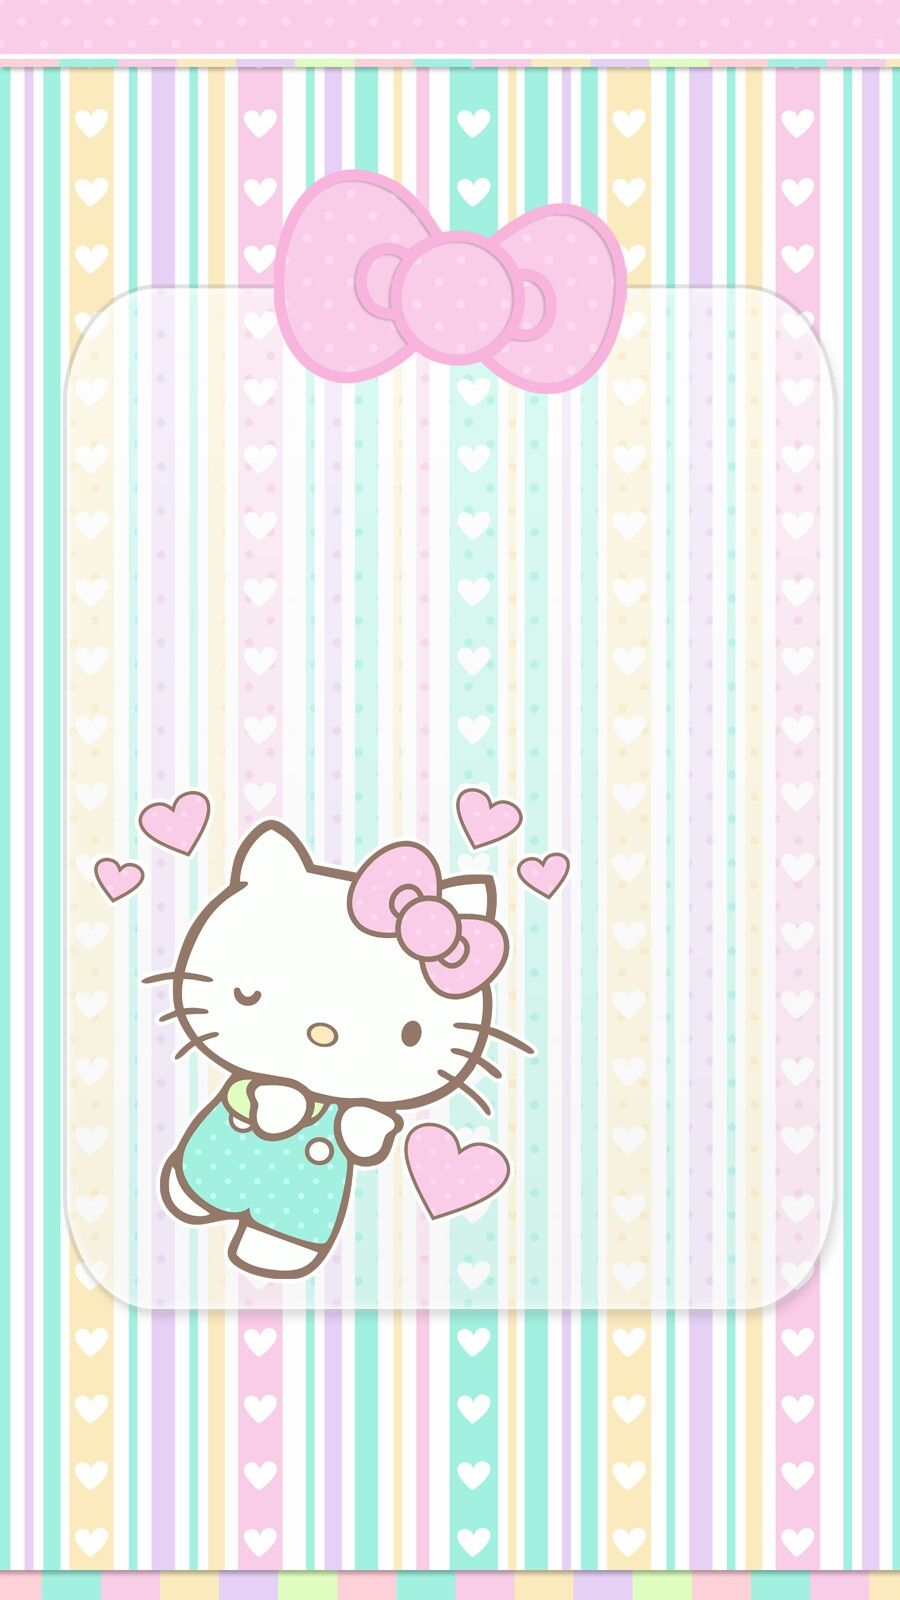 Great Wallpaper Hello Kitty Iphone 4 - c92883d7271cfd4f9daebcc38bea1582  Snapshot_245889.jpg